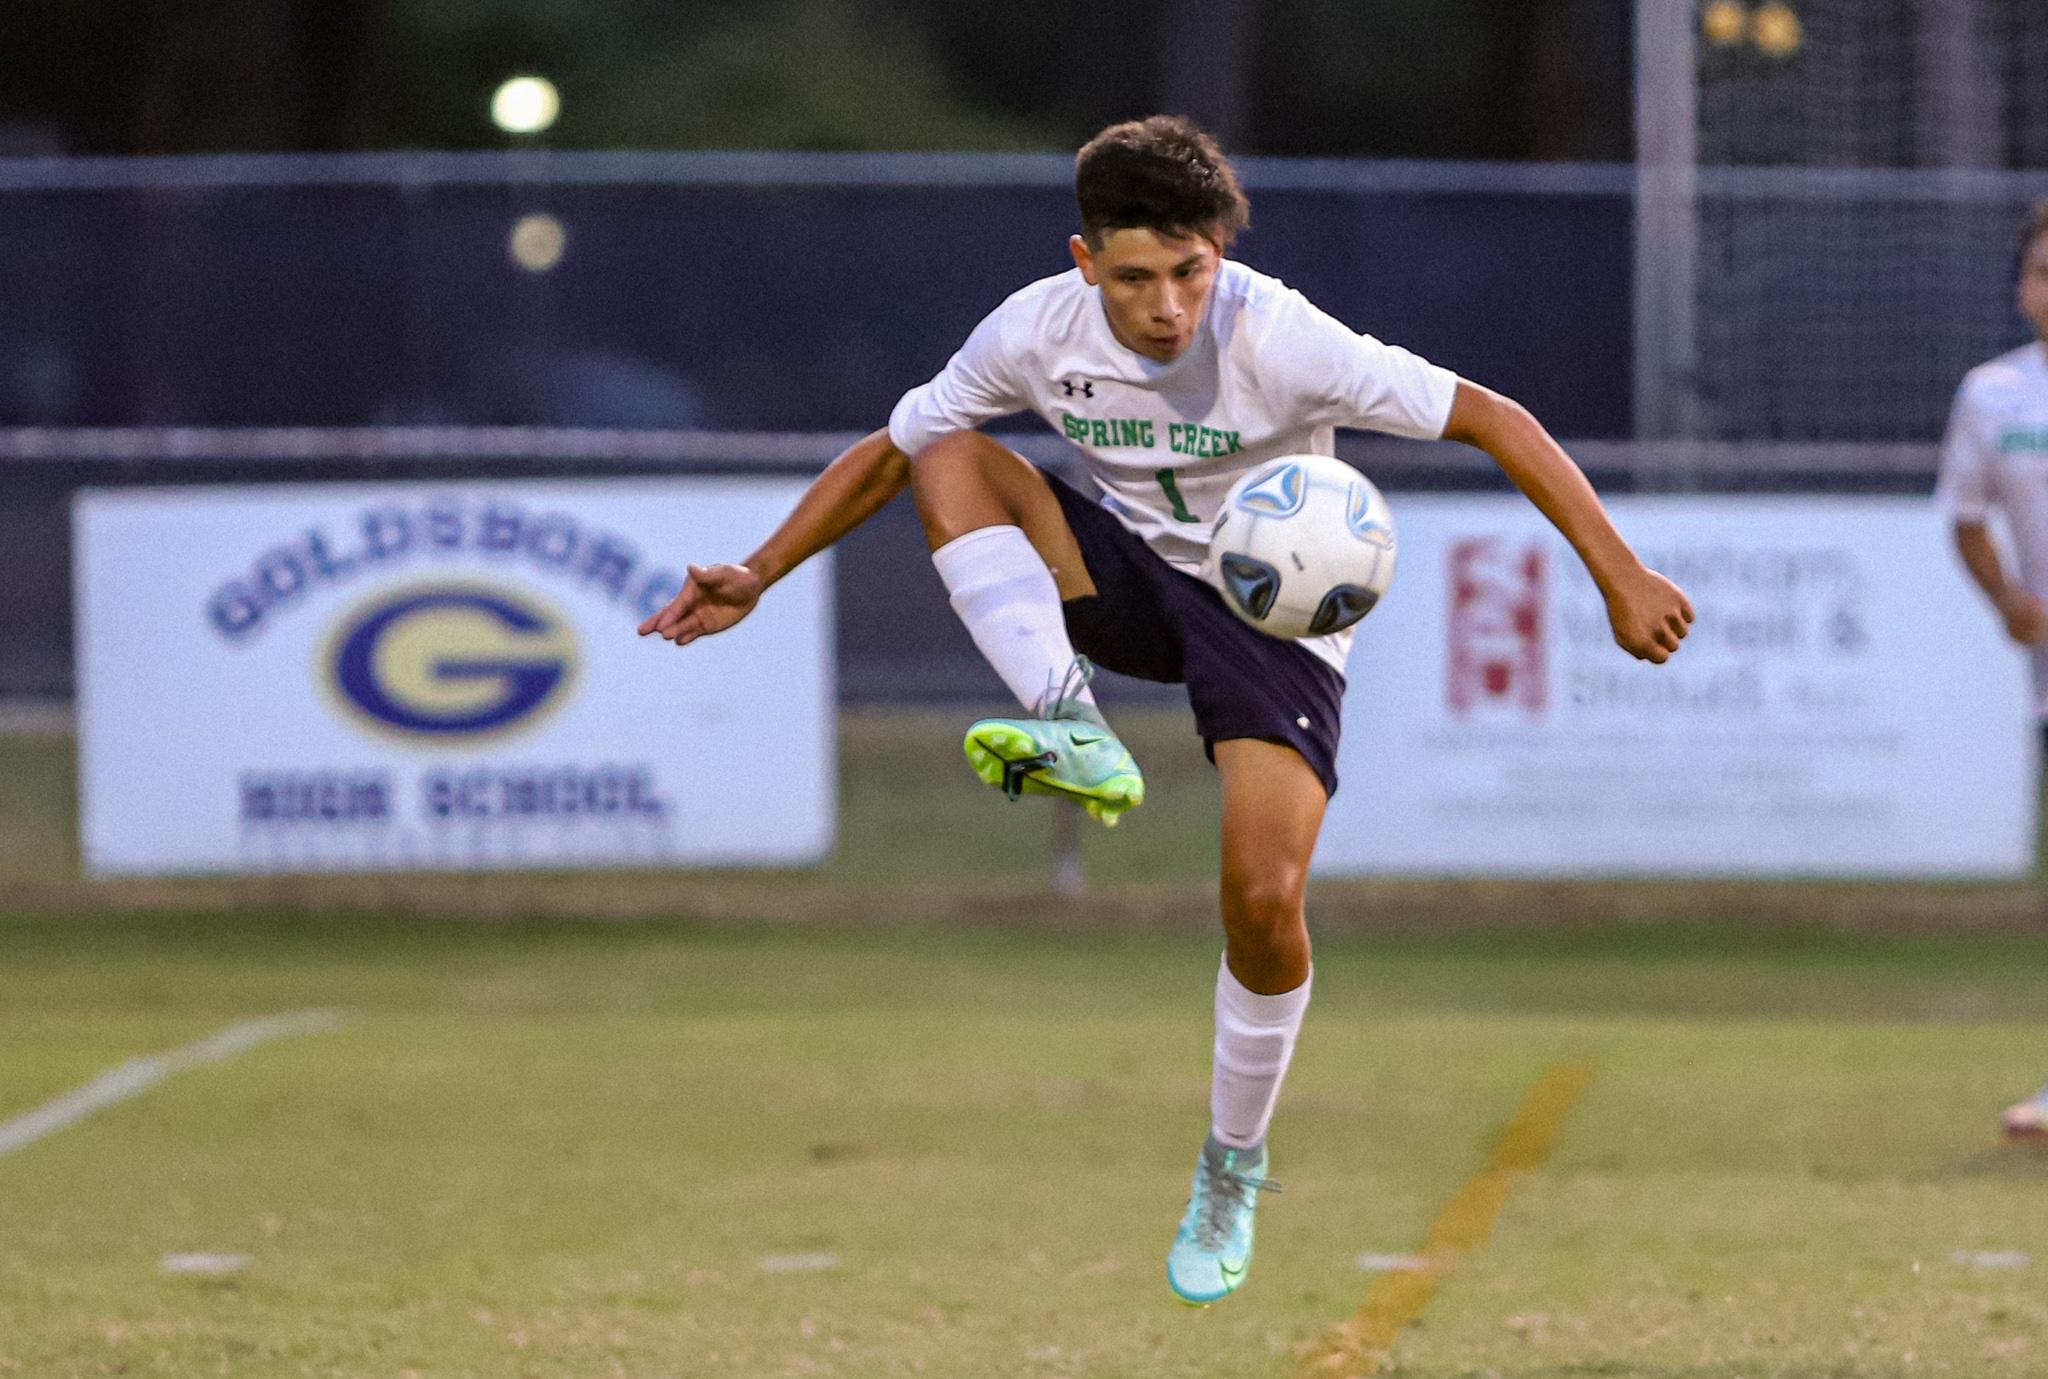 Boys Soccer: Spring Creek Shuts Out Goldsboro (PHOTO GALLERY)